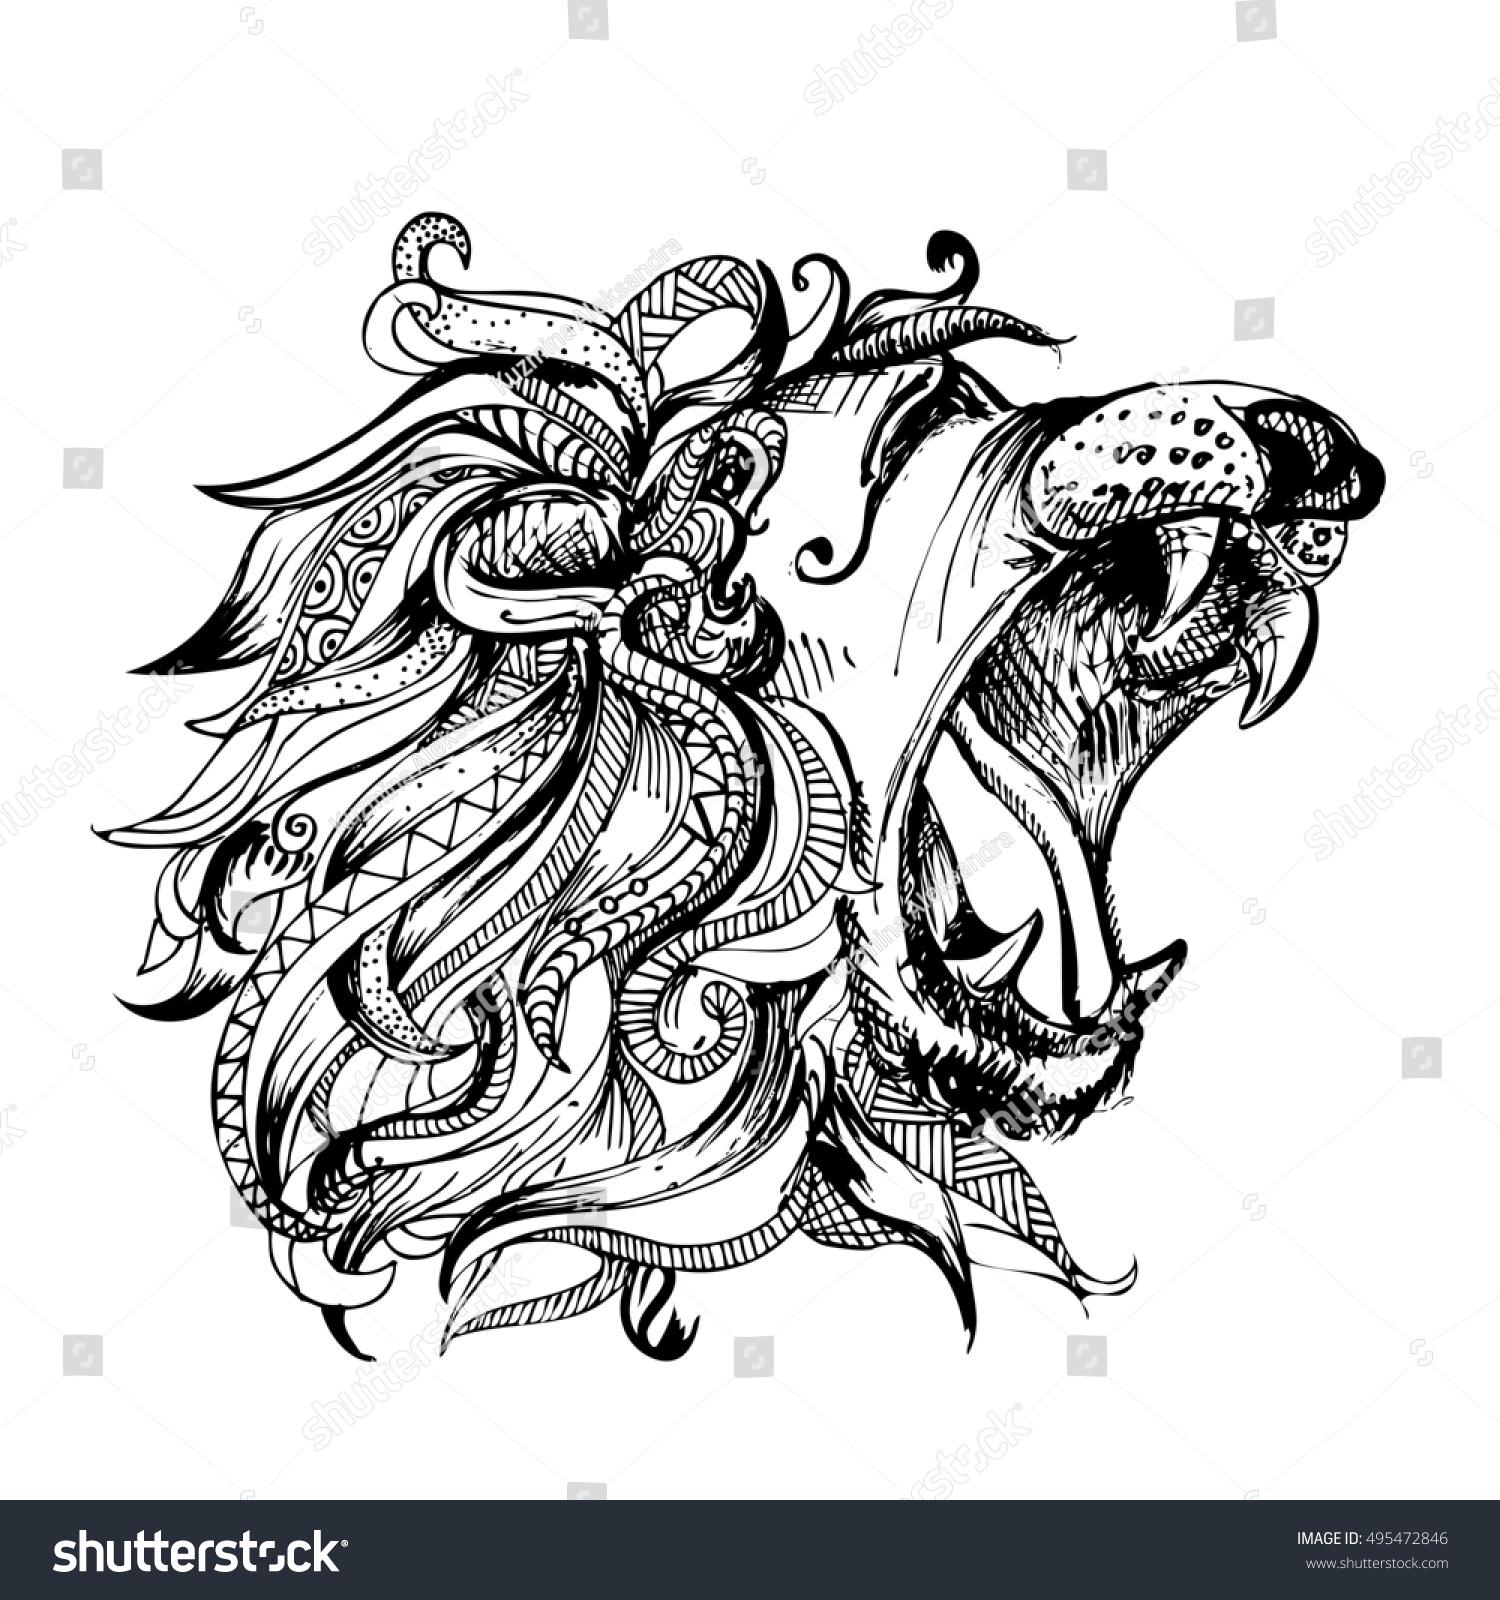 Hand Drawn Illustration Doodle Lion Open Stock